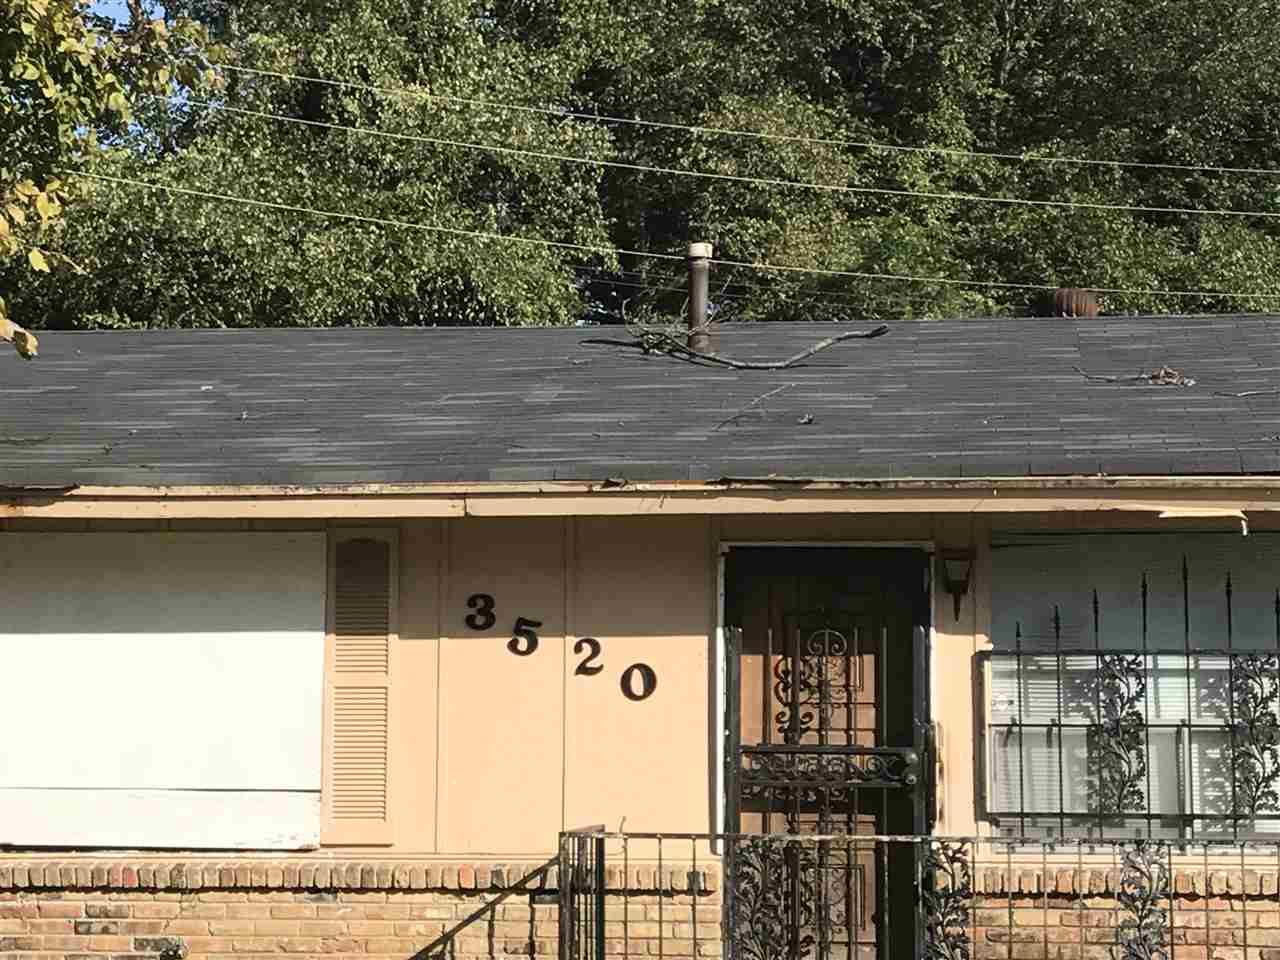 3520 Pueblo Memphis, TN 38127 - MLS #: 10013105